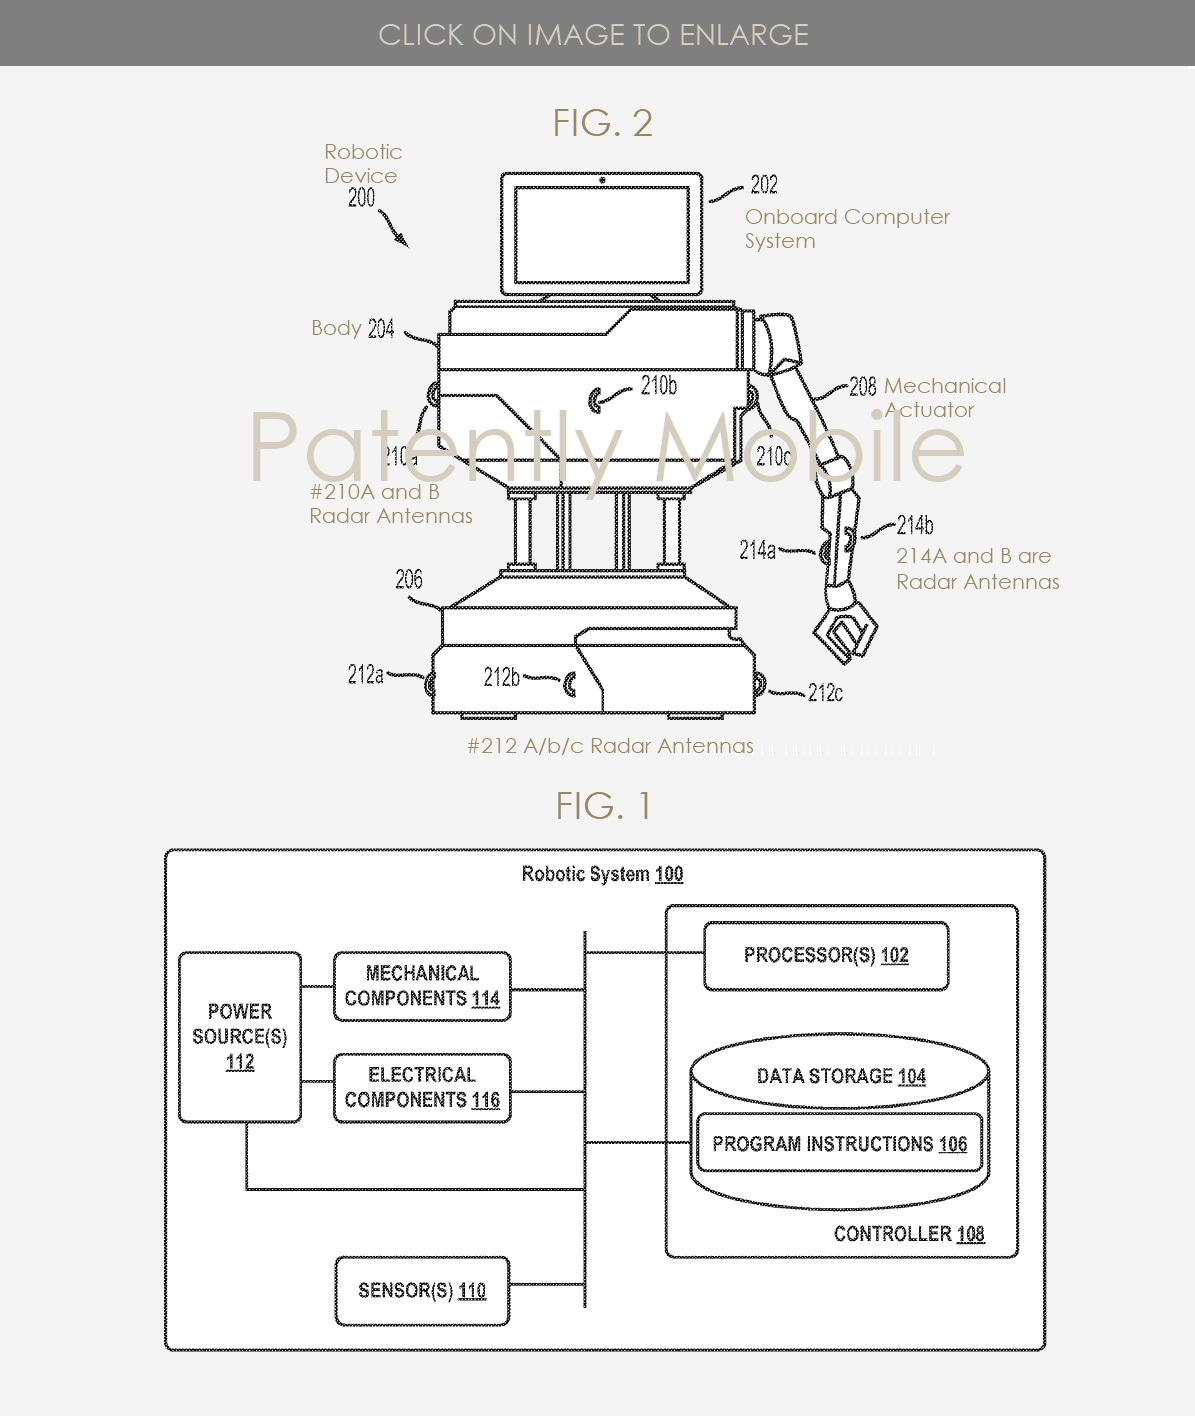 brevetto google assistant robot (1)